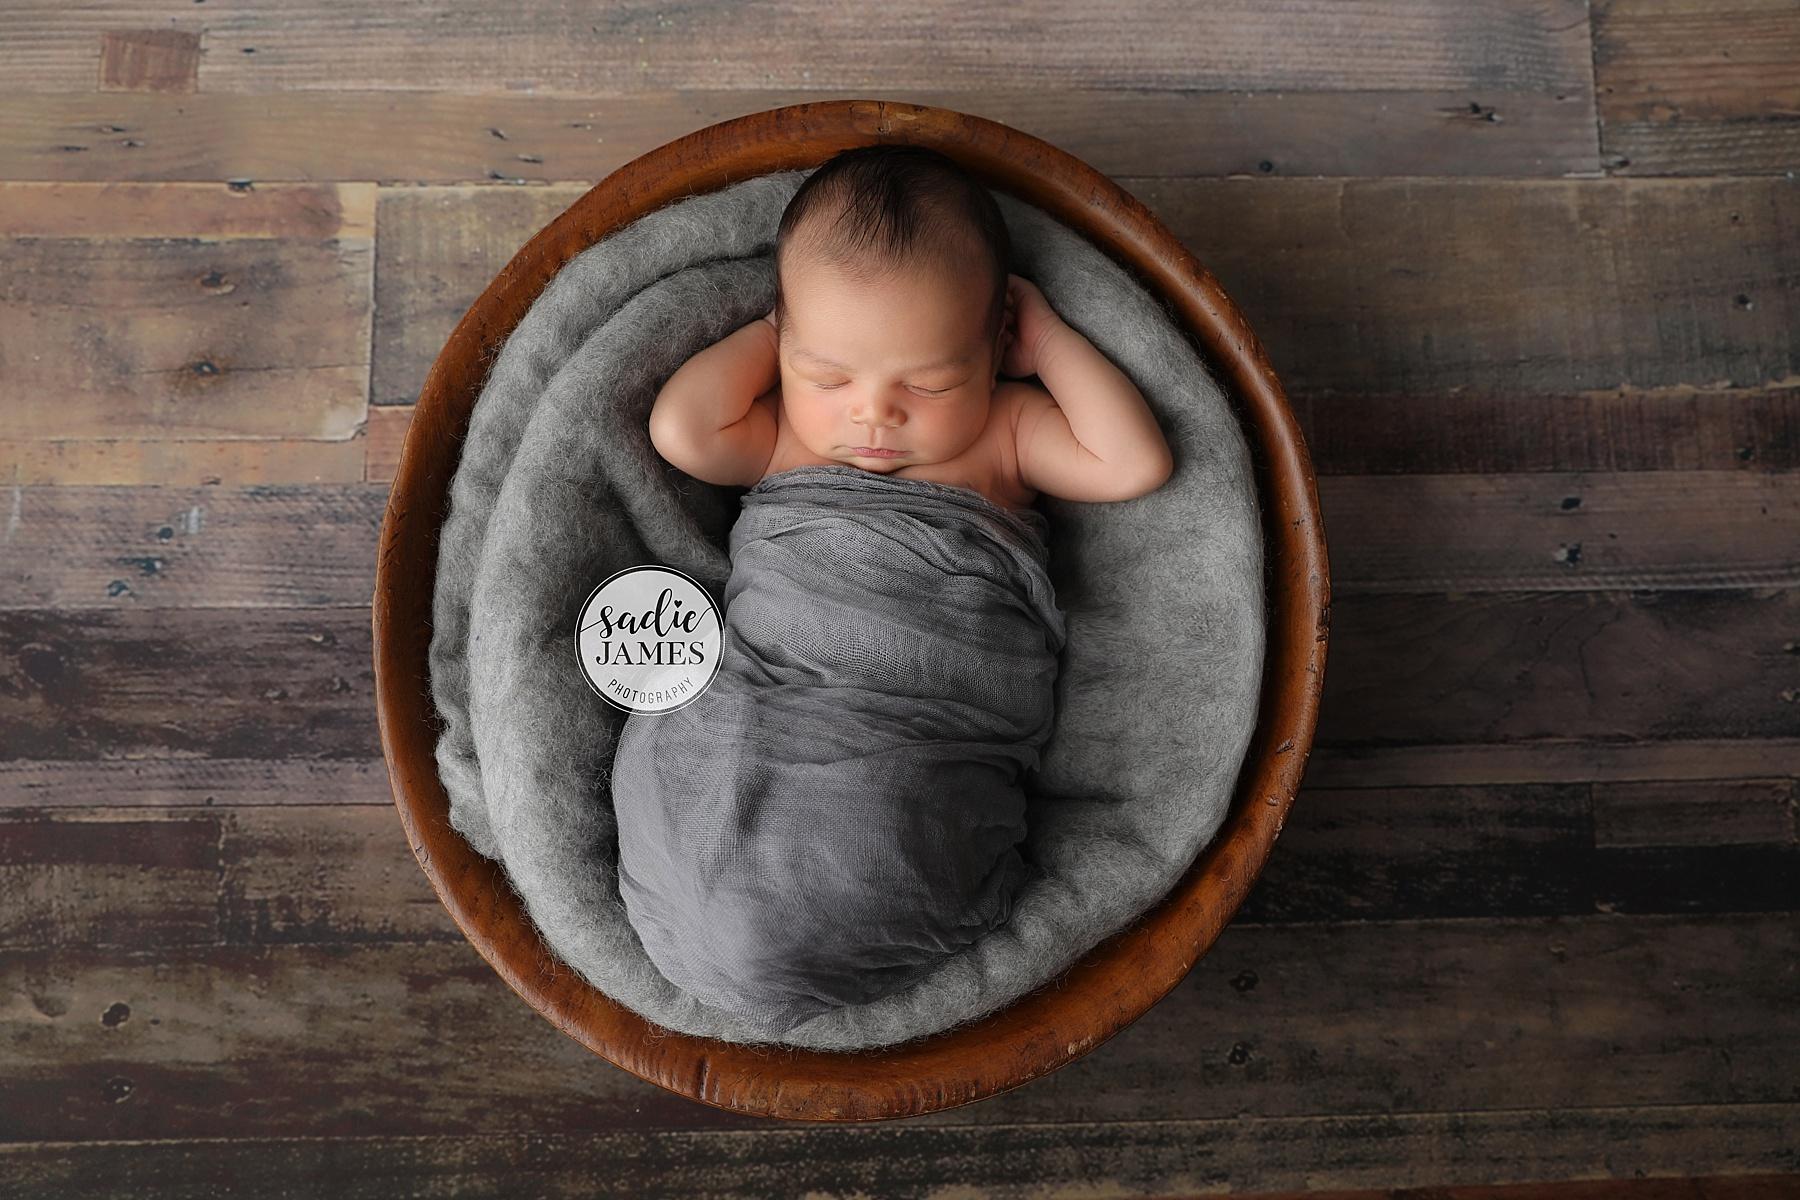 Sadie James Photography | CA newborn photographer | Orange County CA newborn photographer | Orange County newborn photographer | California newborn photographer | California newborn photographer